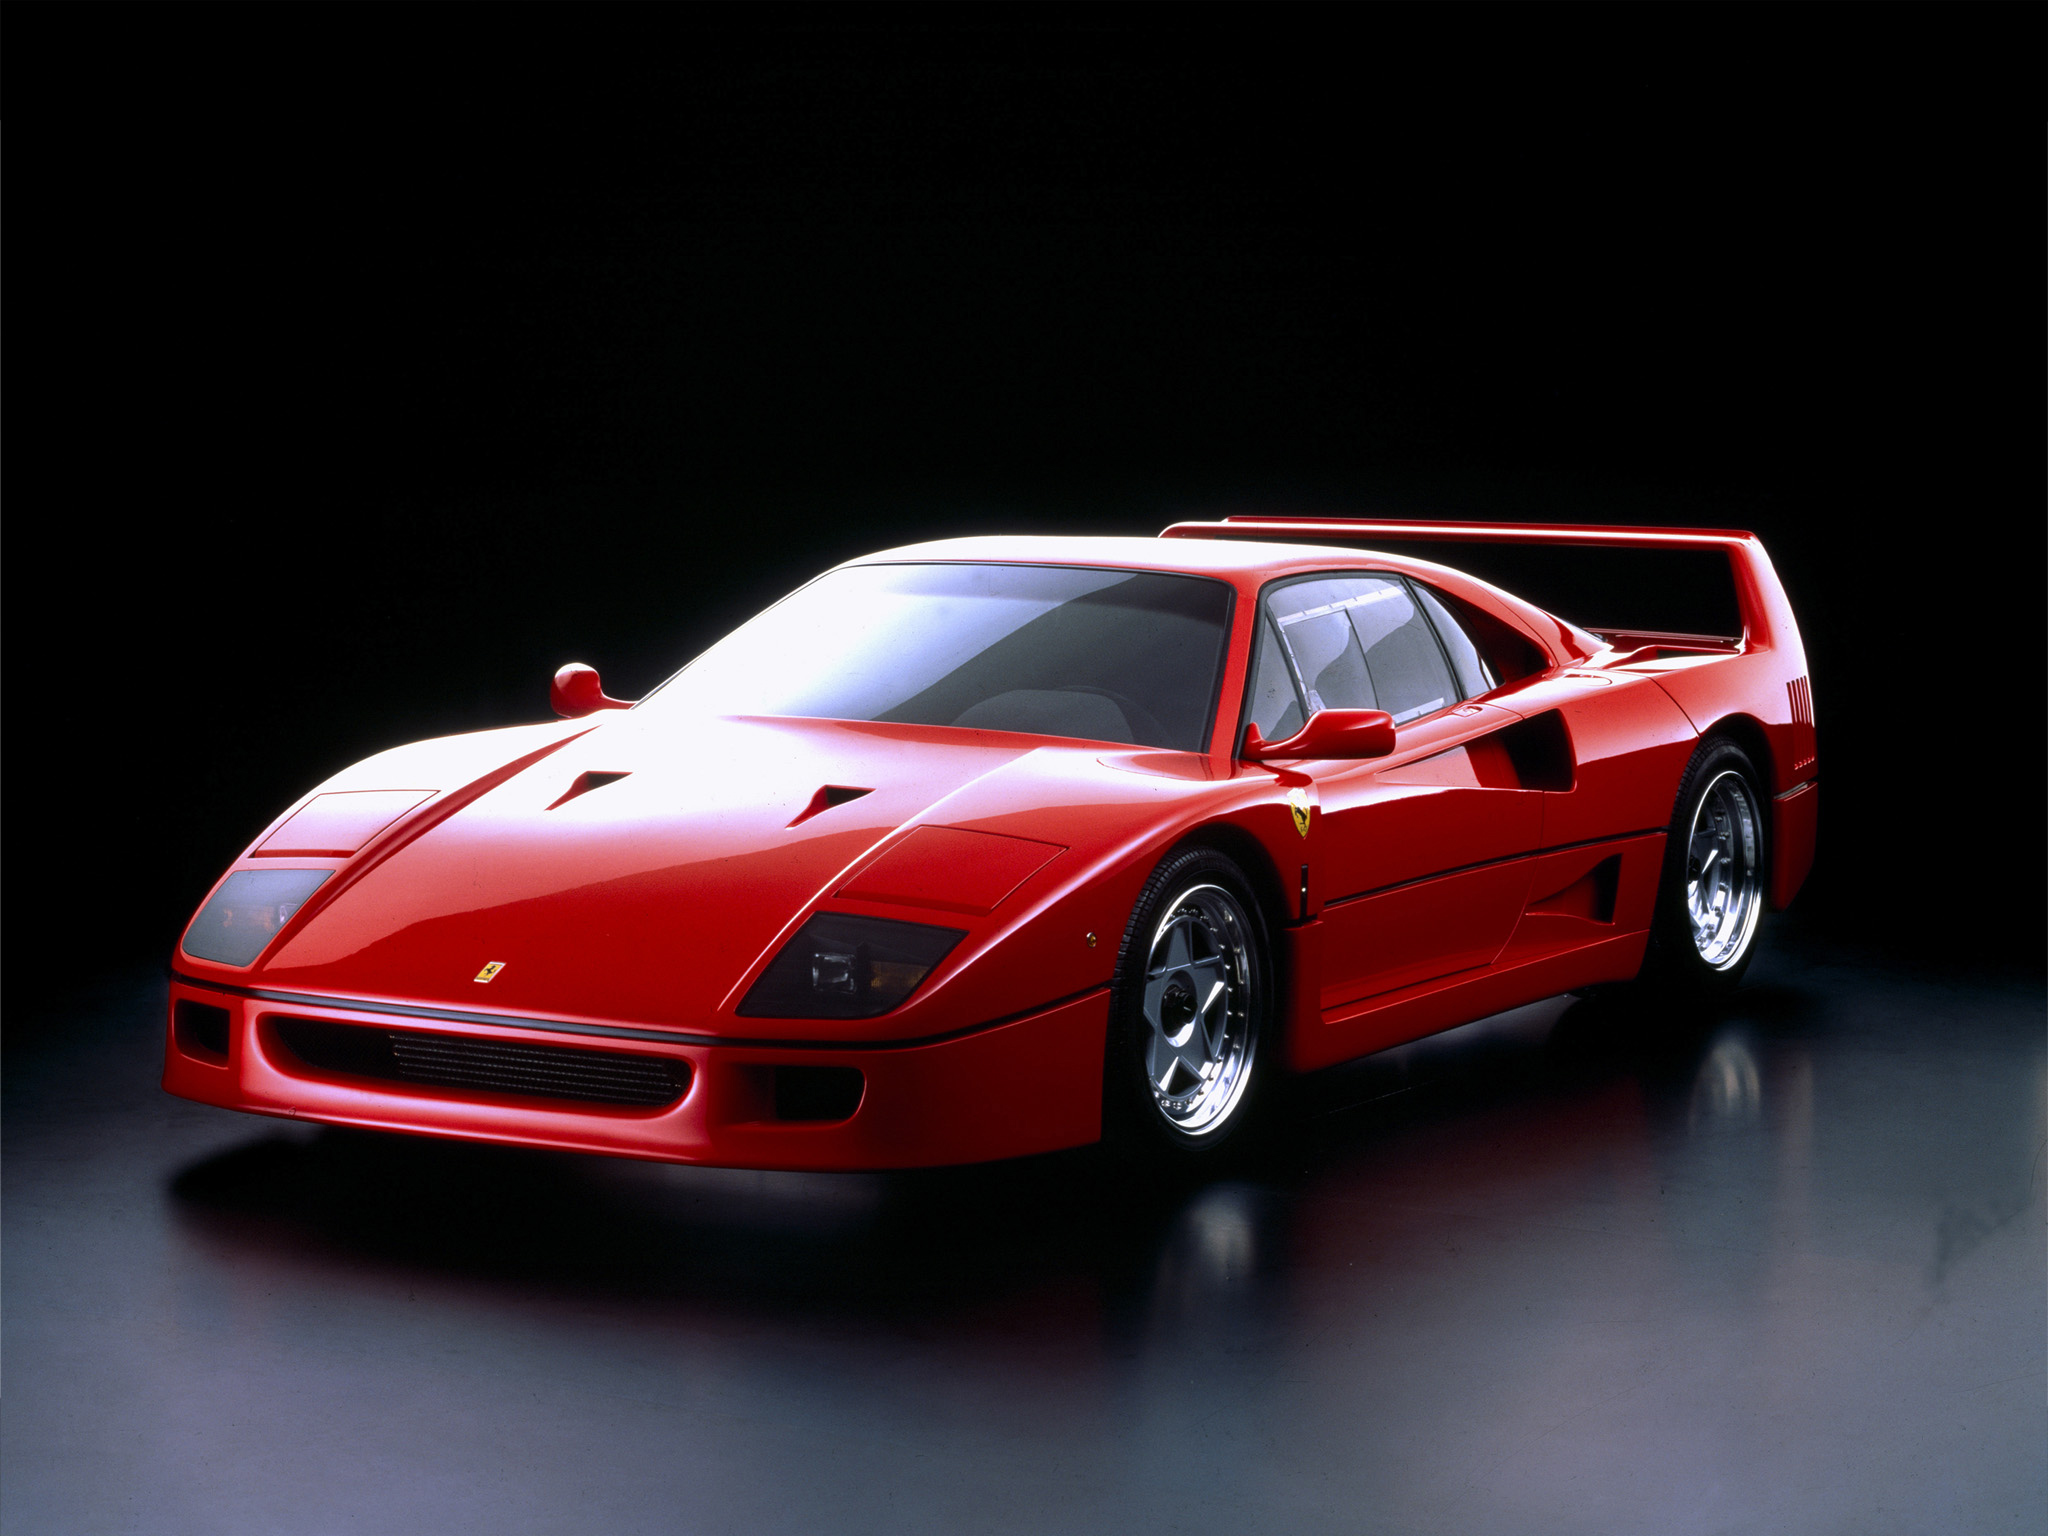 Ferrari F40 Prototipo - 1987 - front / avant